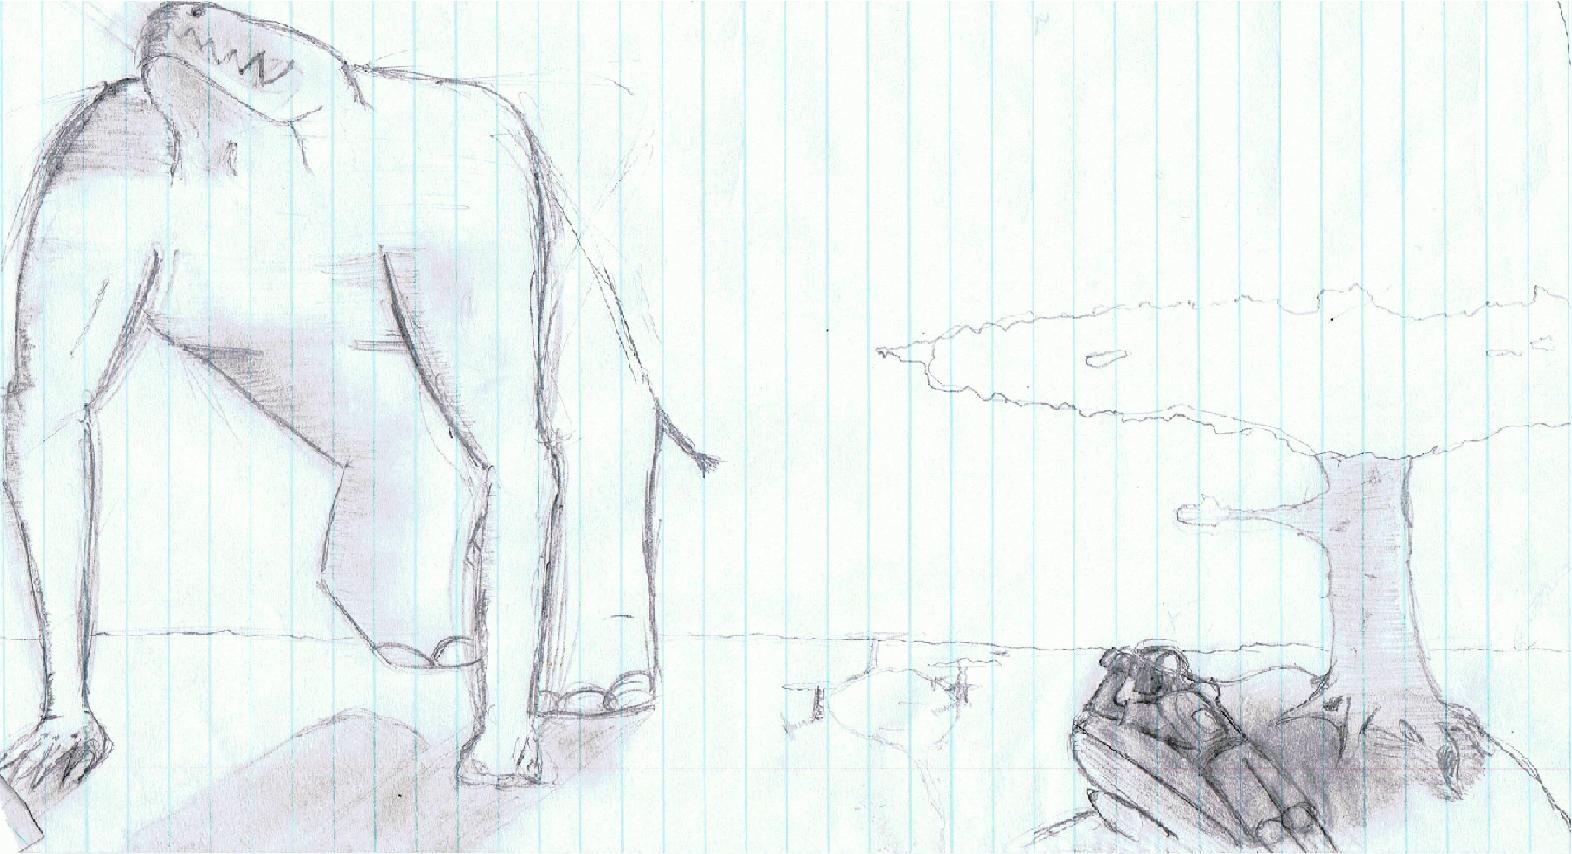 Savanna Titan - Hand Drawn